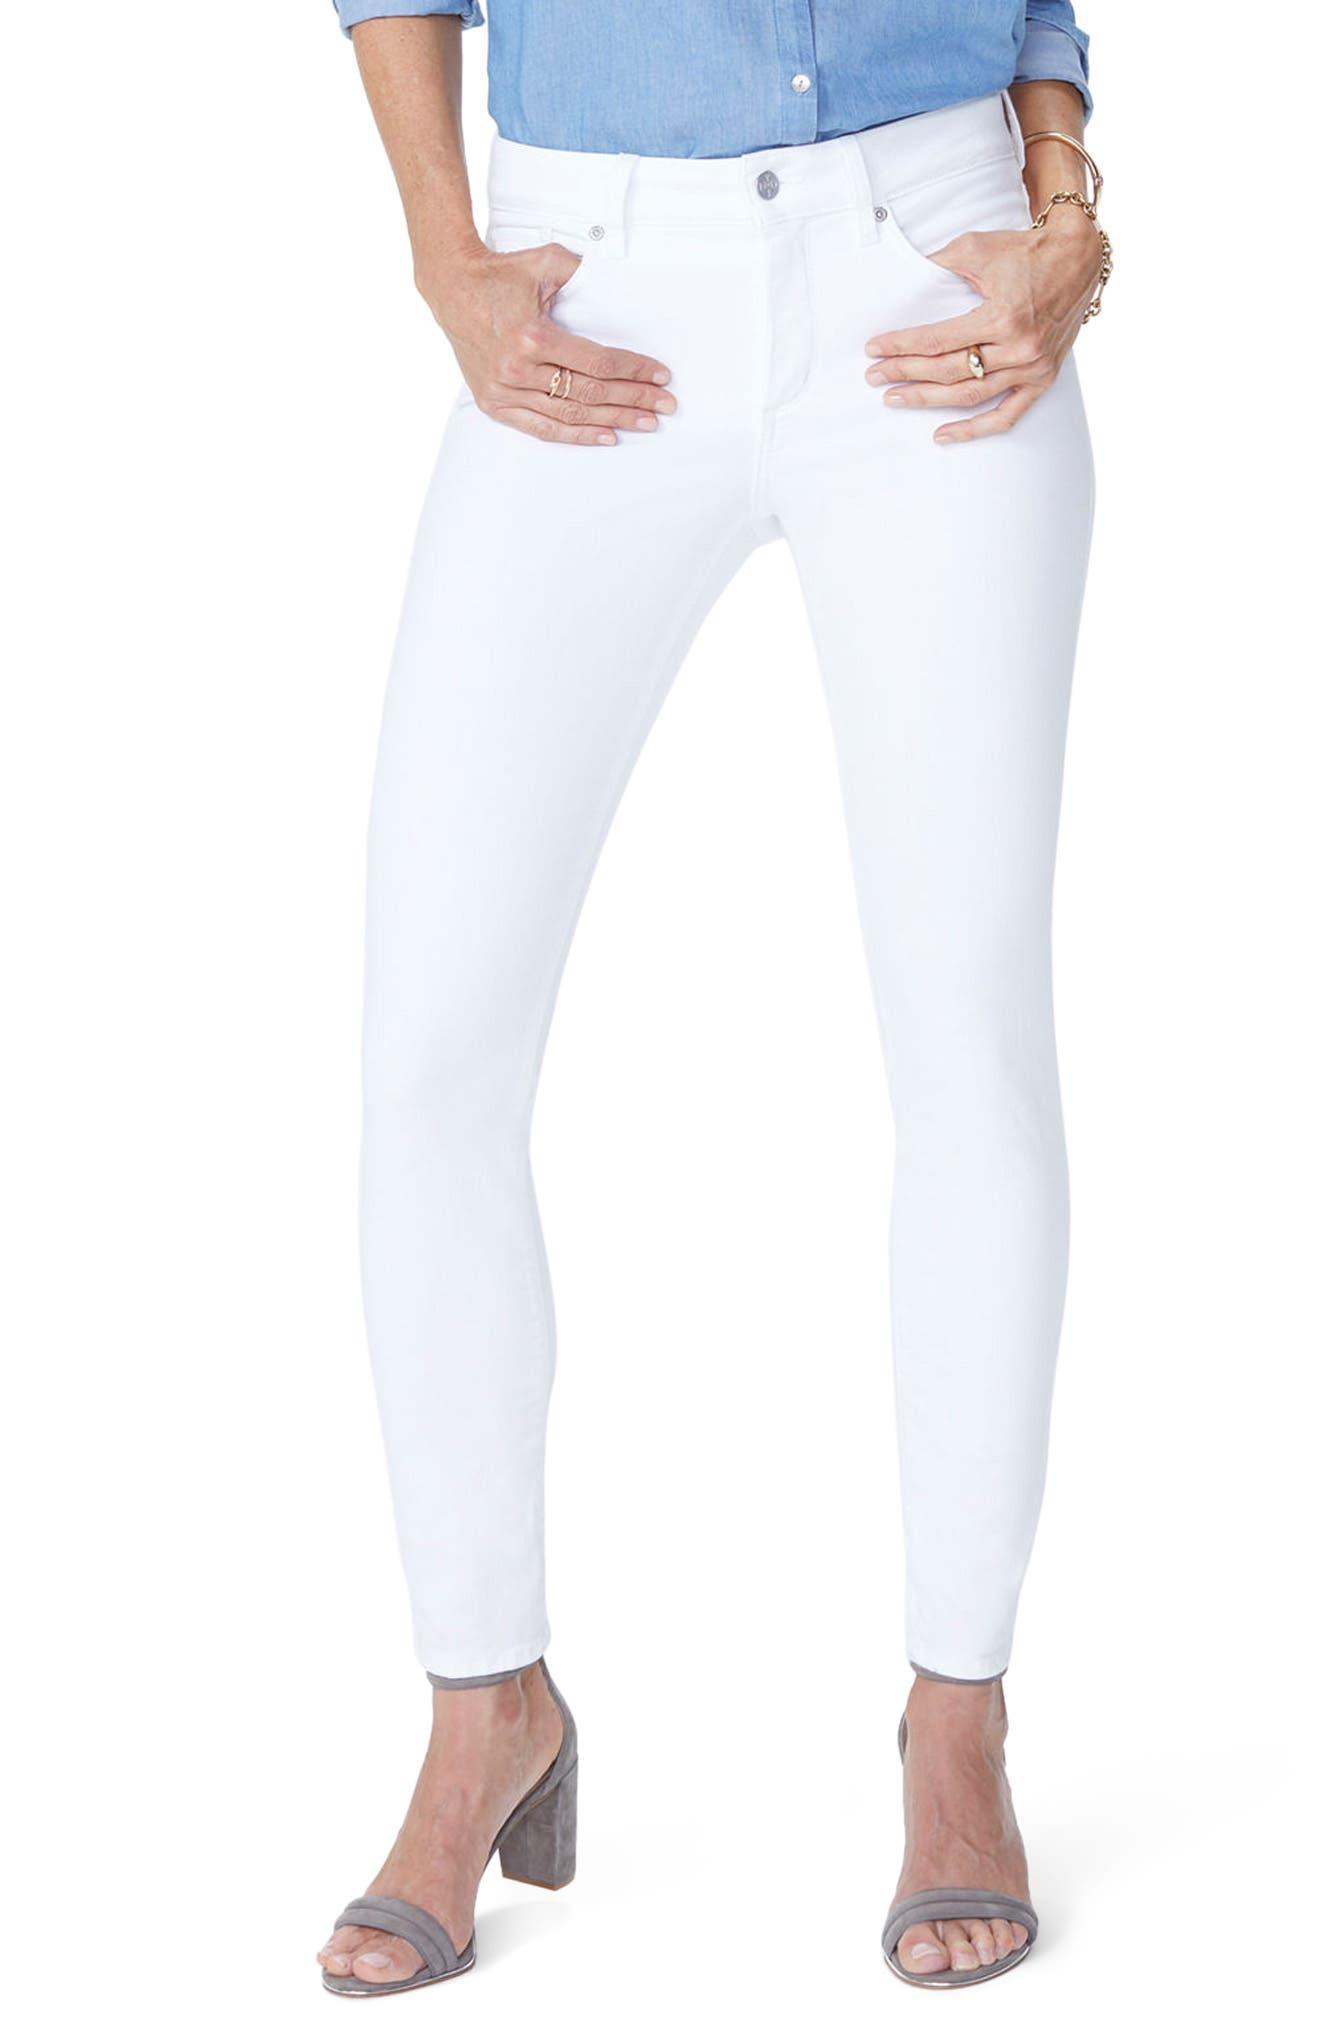 Ami Skinny Jeans,                             Main thumbnail 1, color,                             Optic White